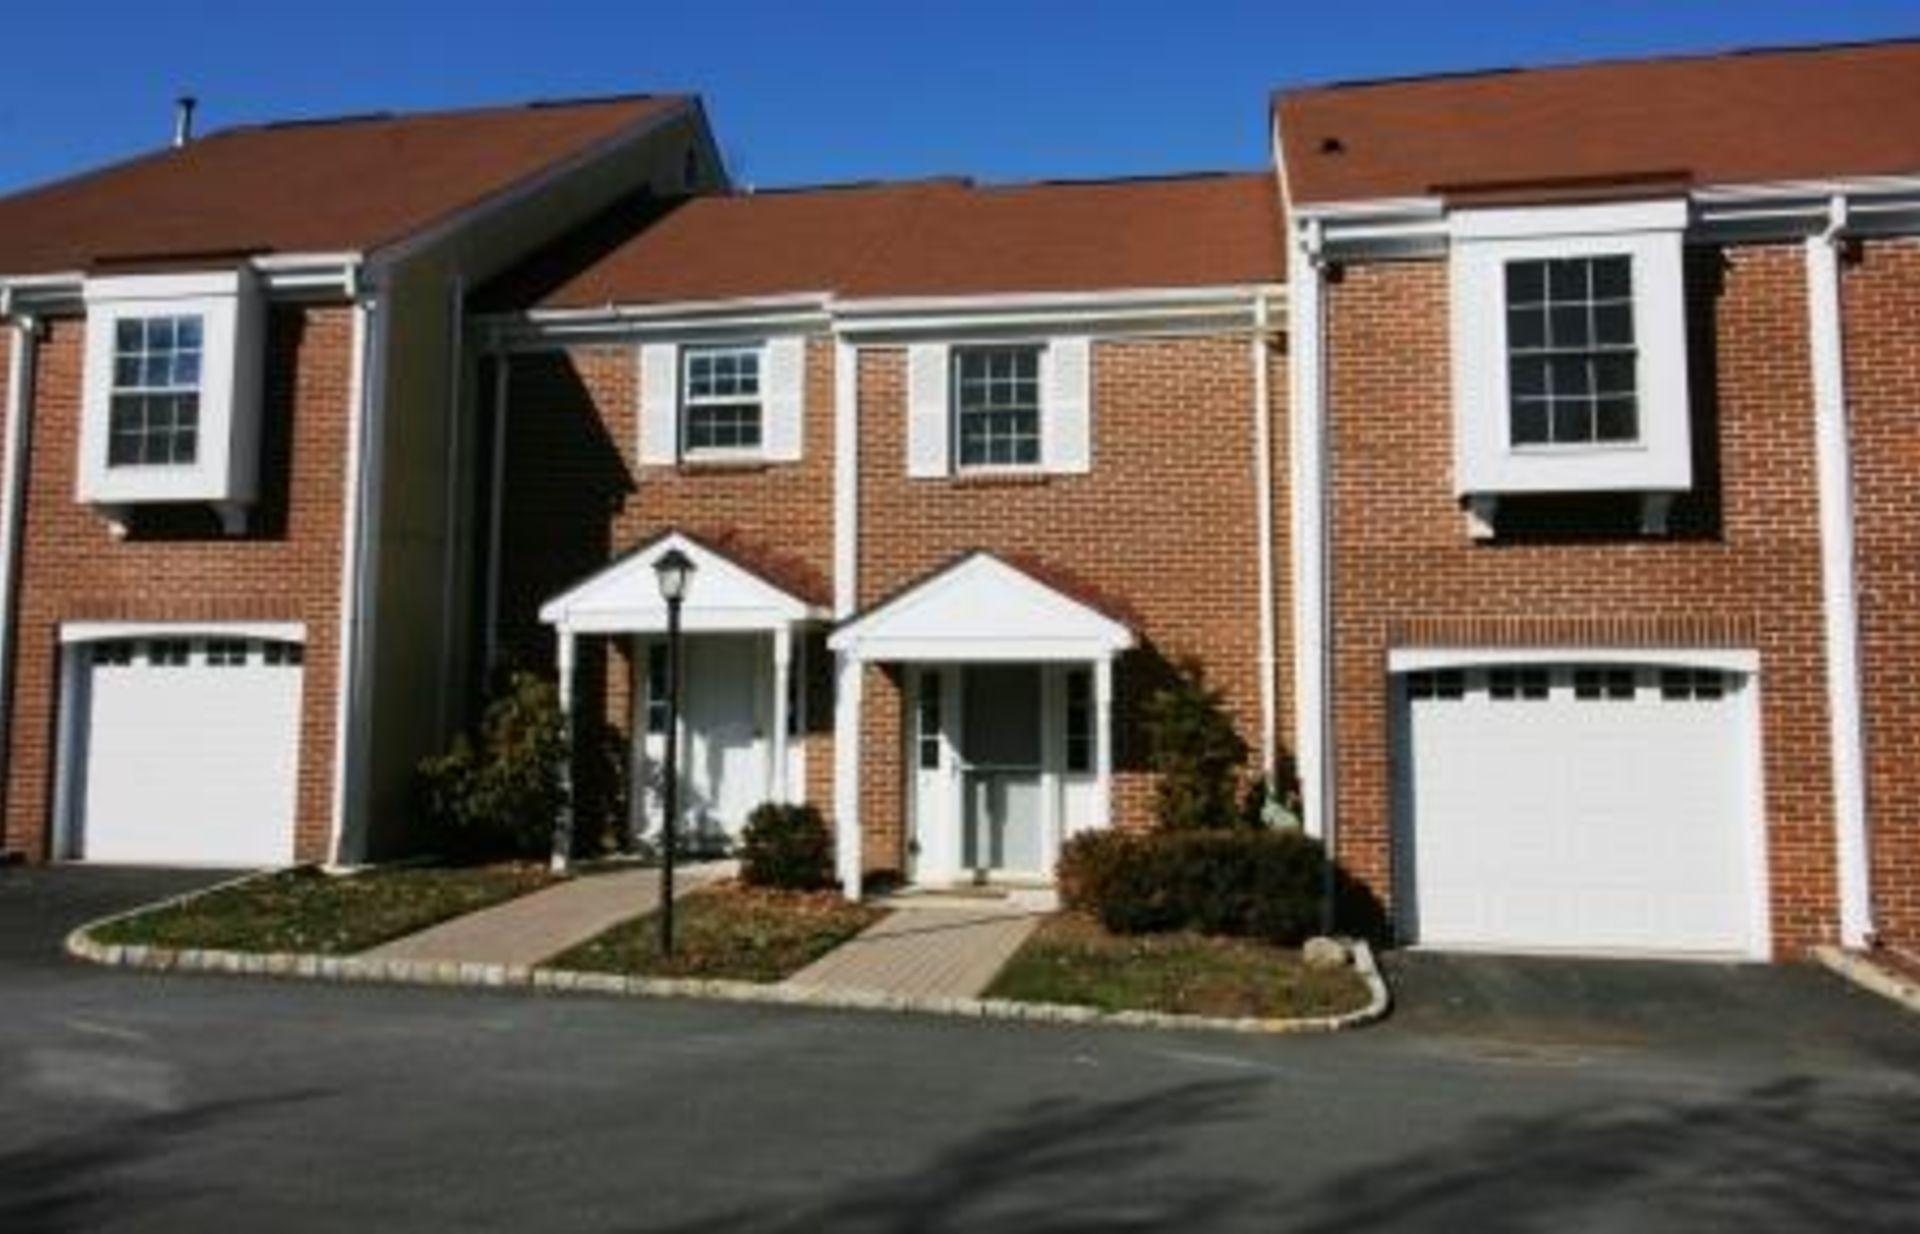 Open House, 2/19, 318 Main St, #9, Madison, NJ 07940